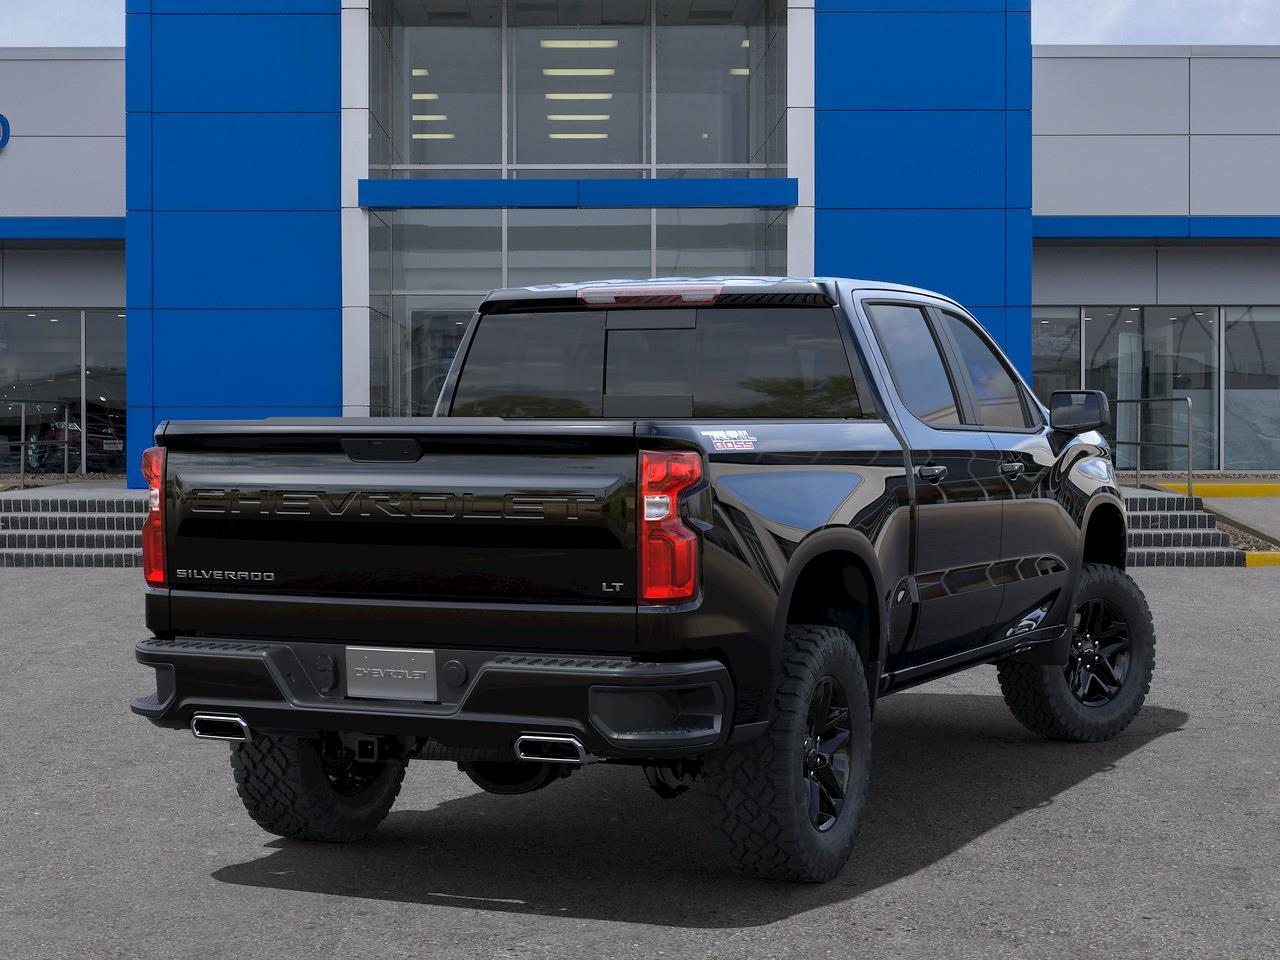 2021 Chevrolet Silverado 1500 Crew Cab 4x4, Pickup #M1338 - photo 2